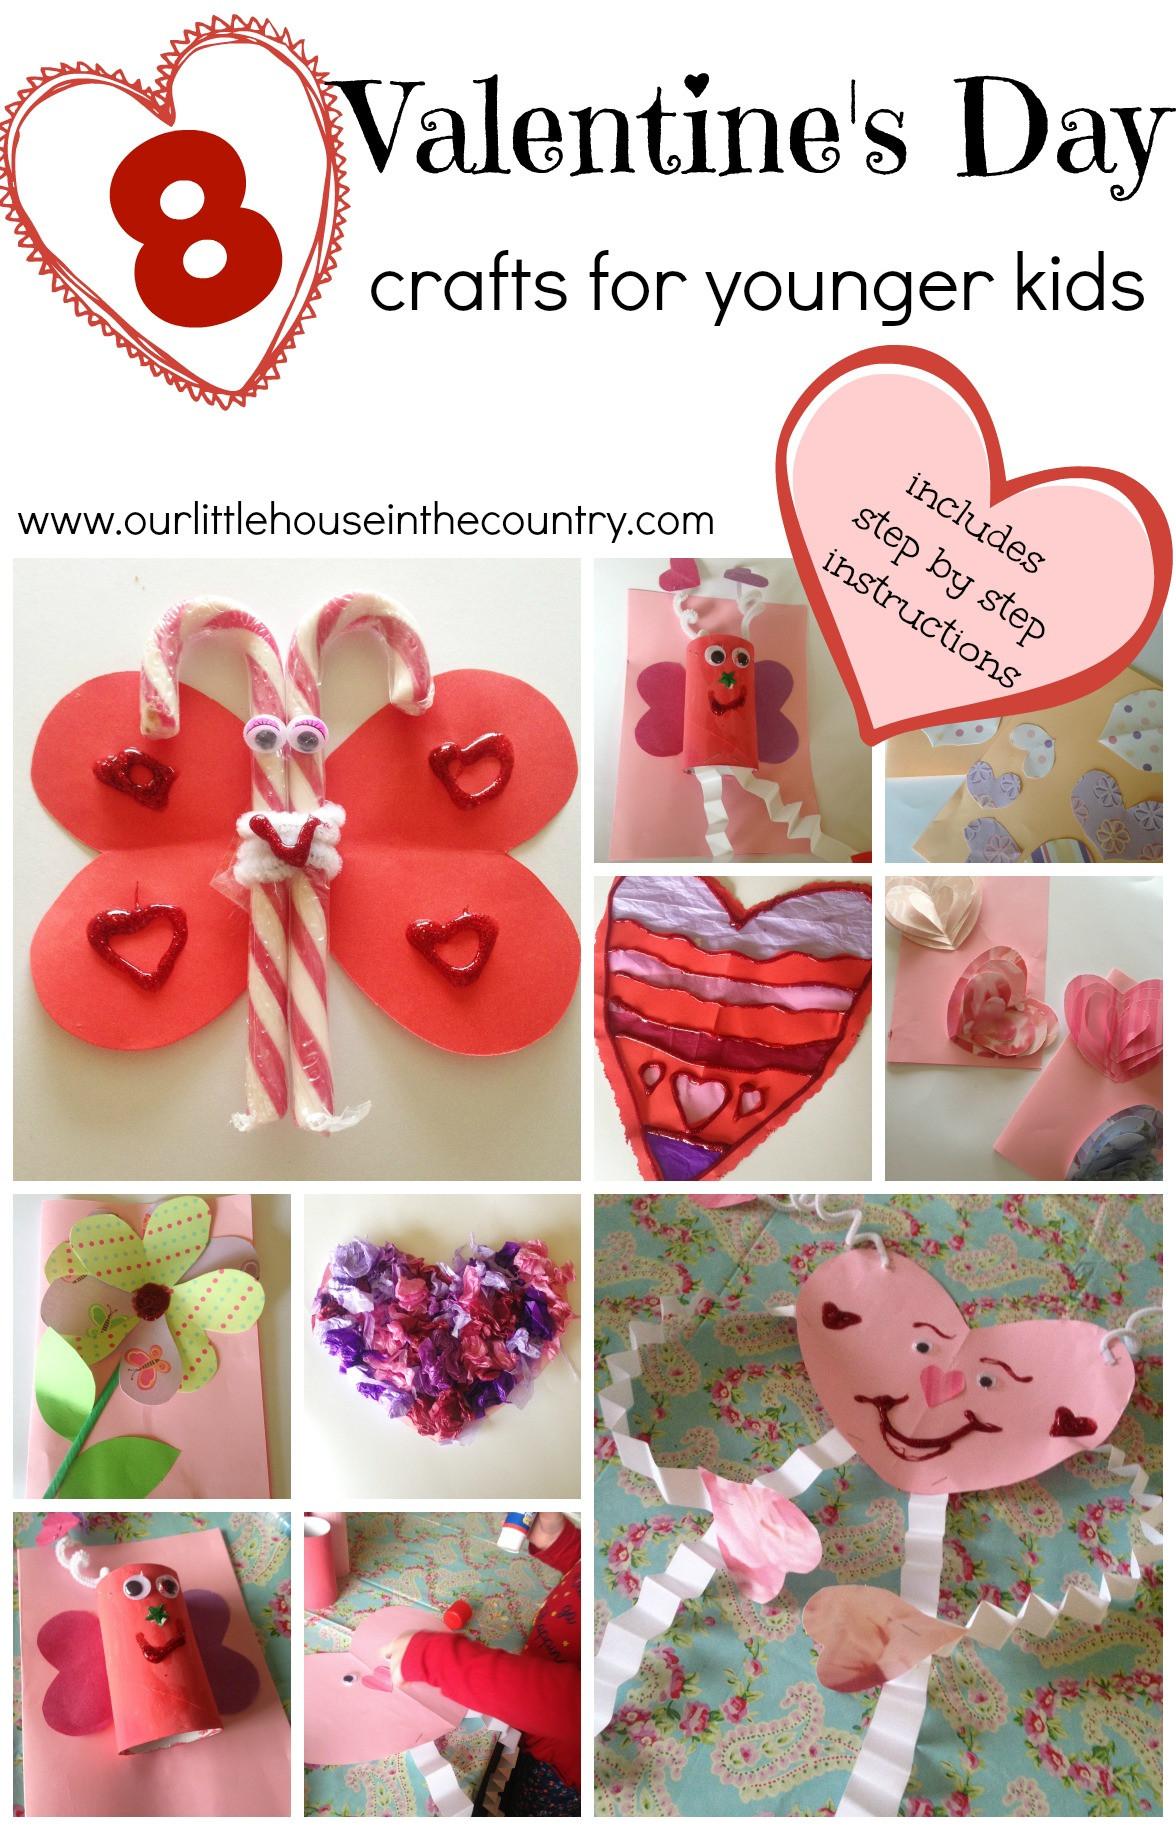 Valentine Crafts Ideas For Preschoolers  Valentine's Day Crafts for Younger Children Preschool and